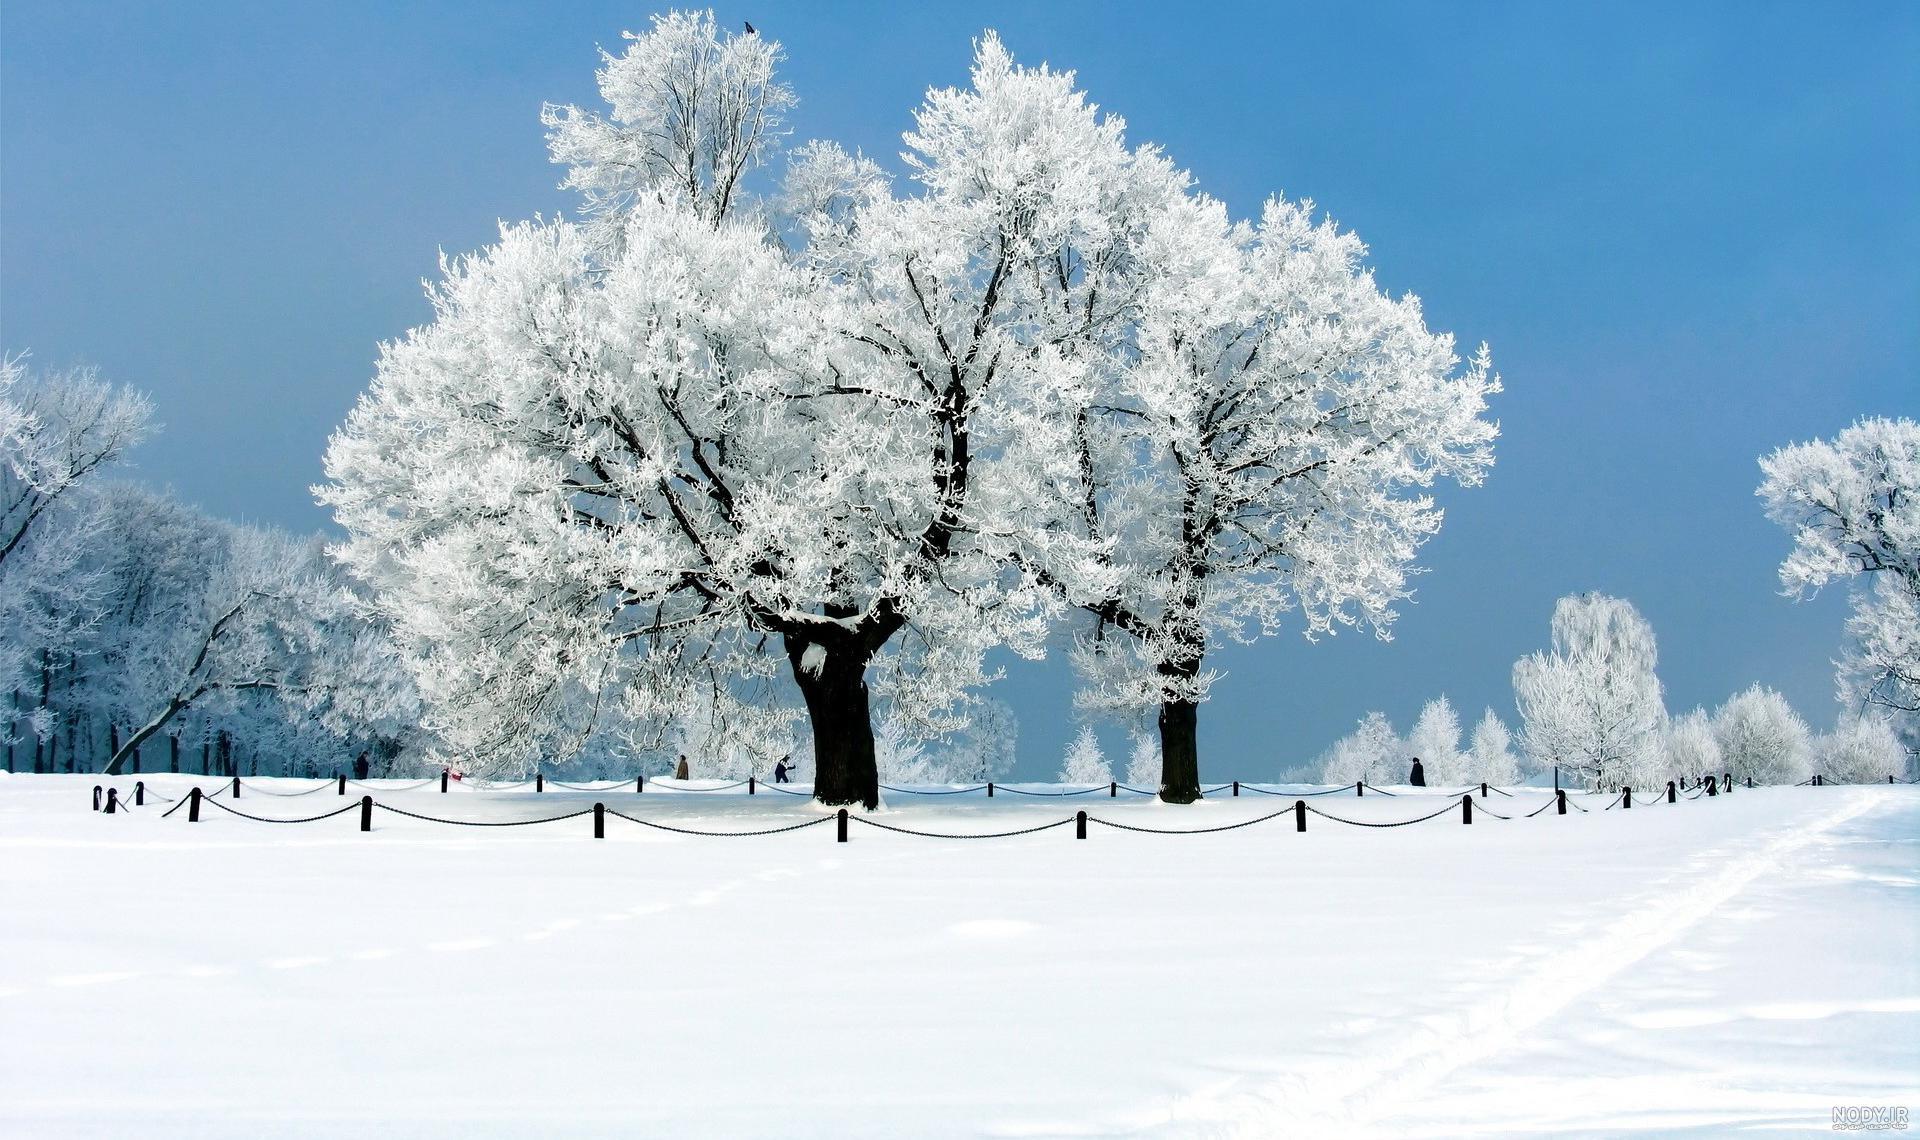 عکس صفحه گوشی زمستان